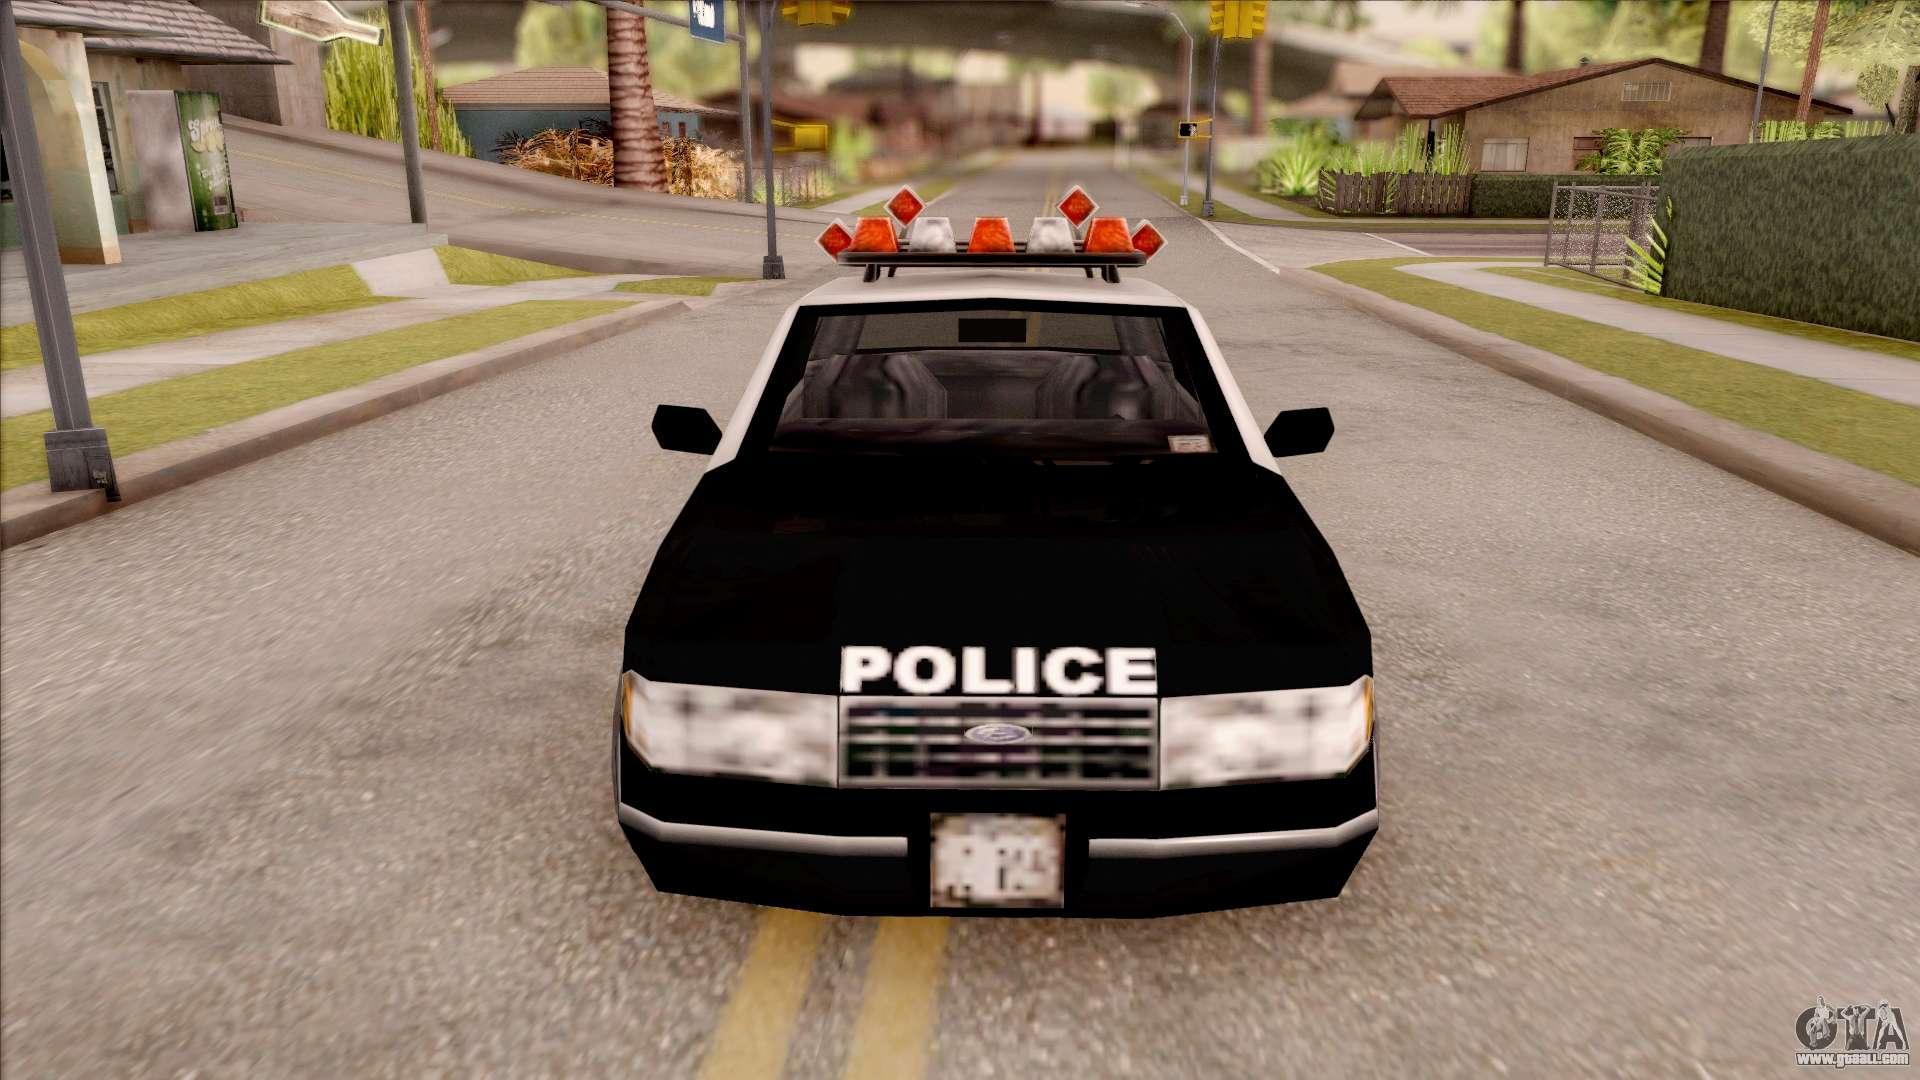 Police Car from GTA 3 for GTA San Andreas Gta San Andreas Cool Mods